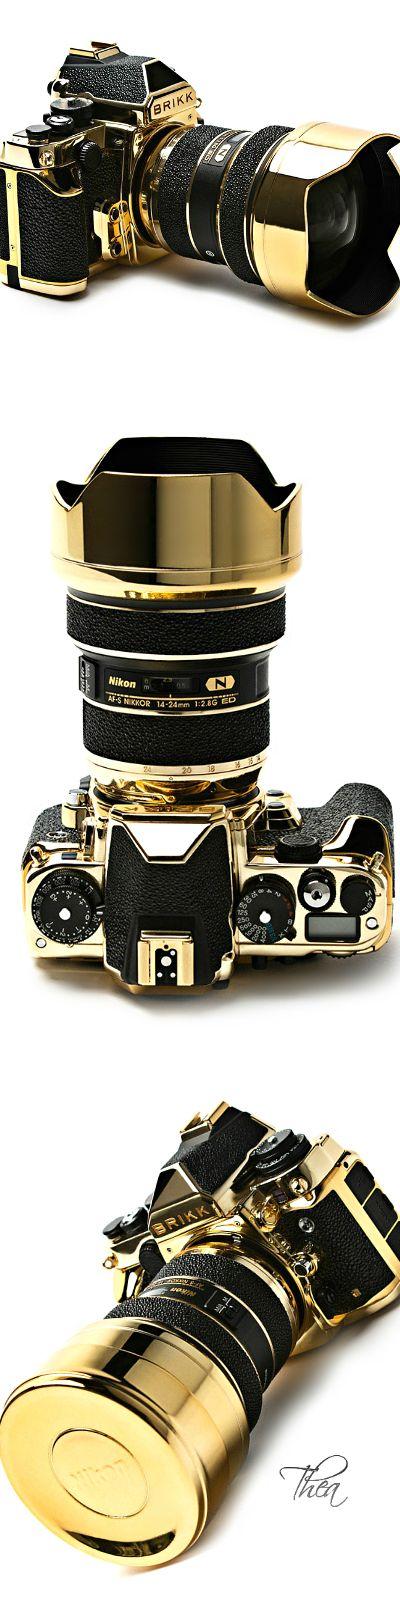 Brikk ● 24K Gold Stingray Lux Nikon DF Camera $58,000